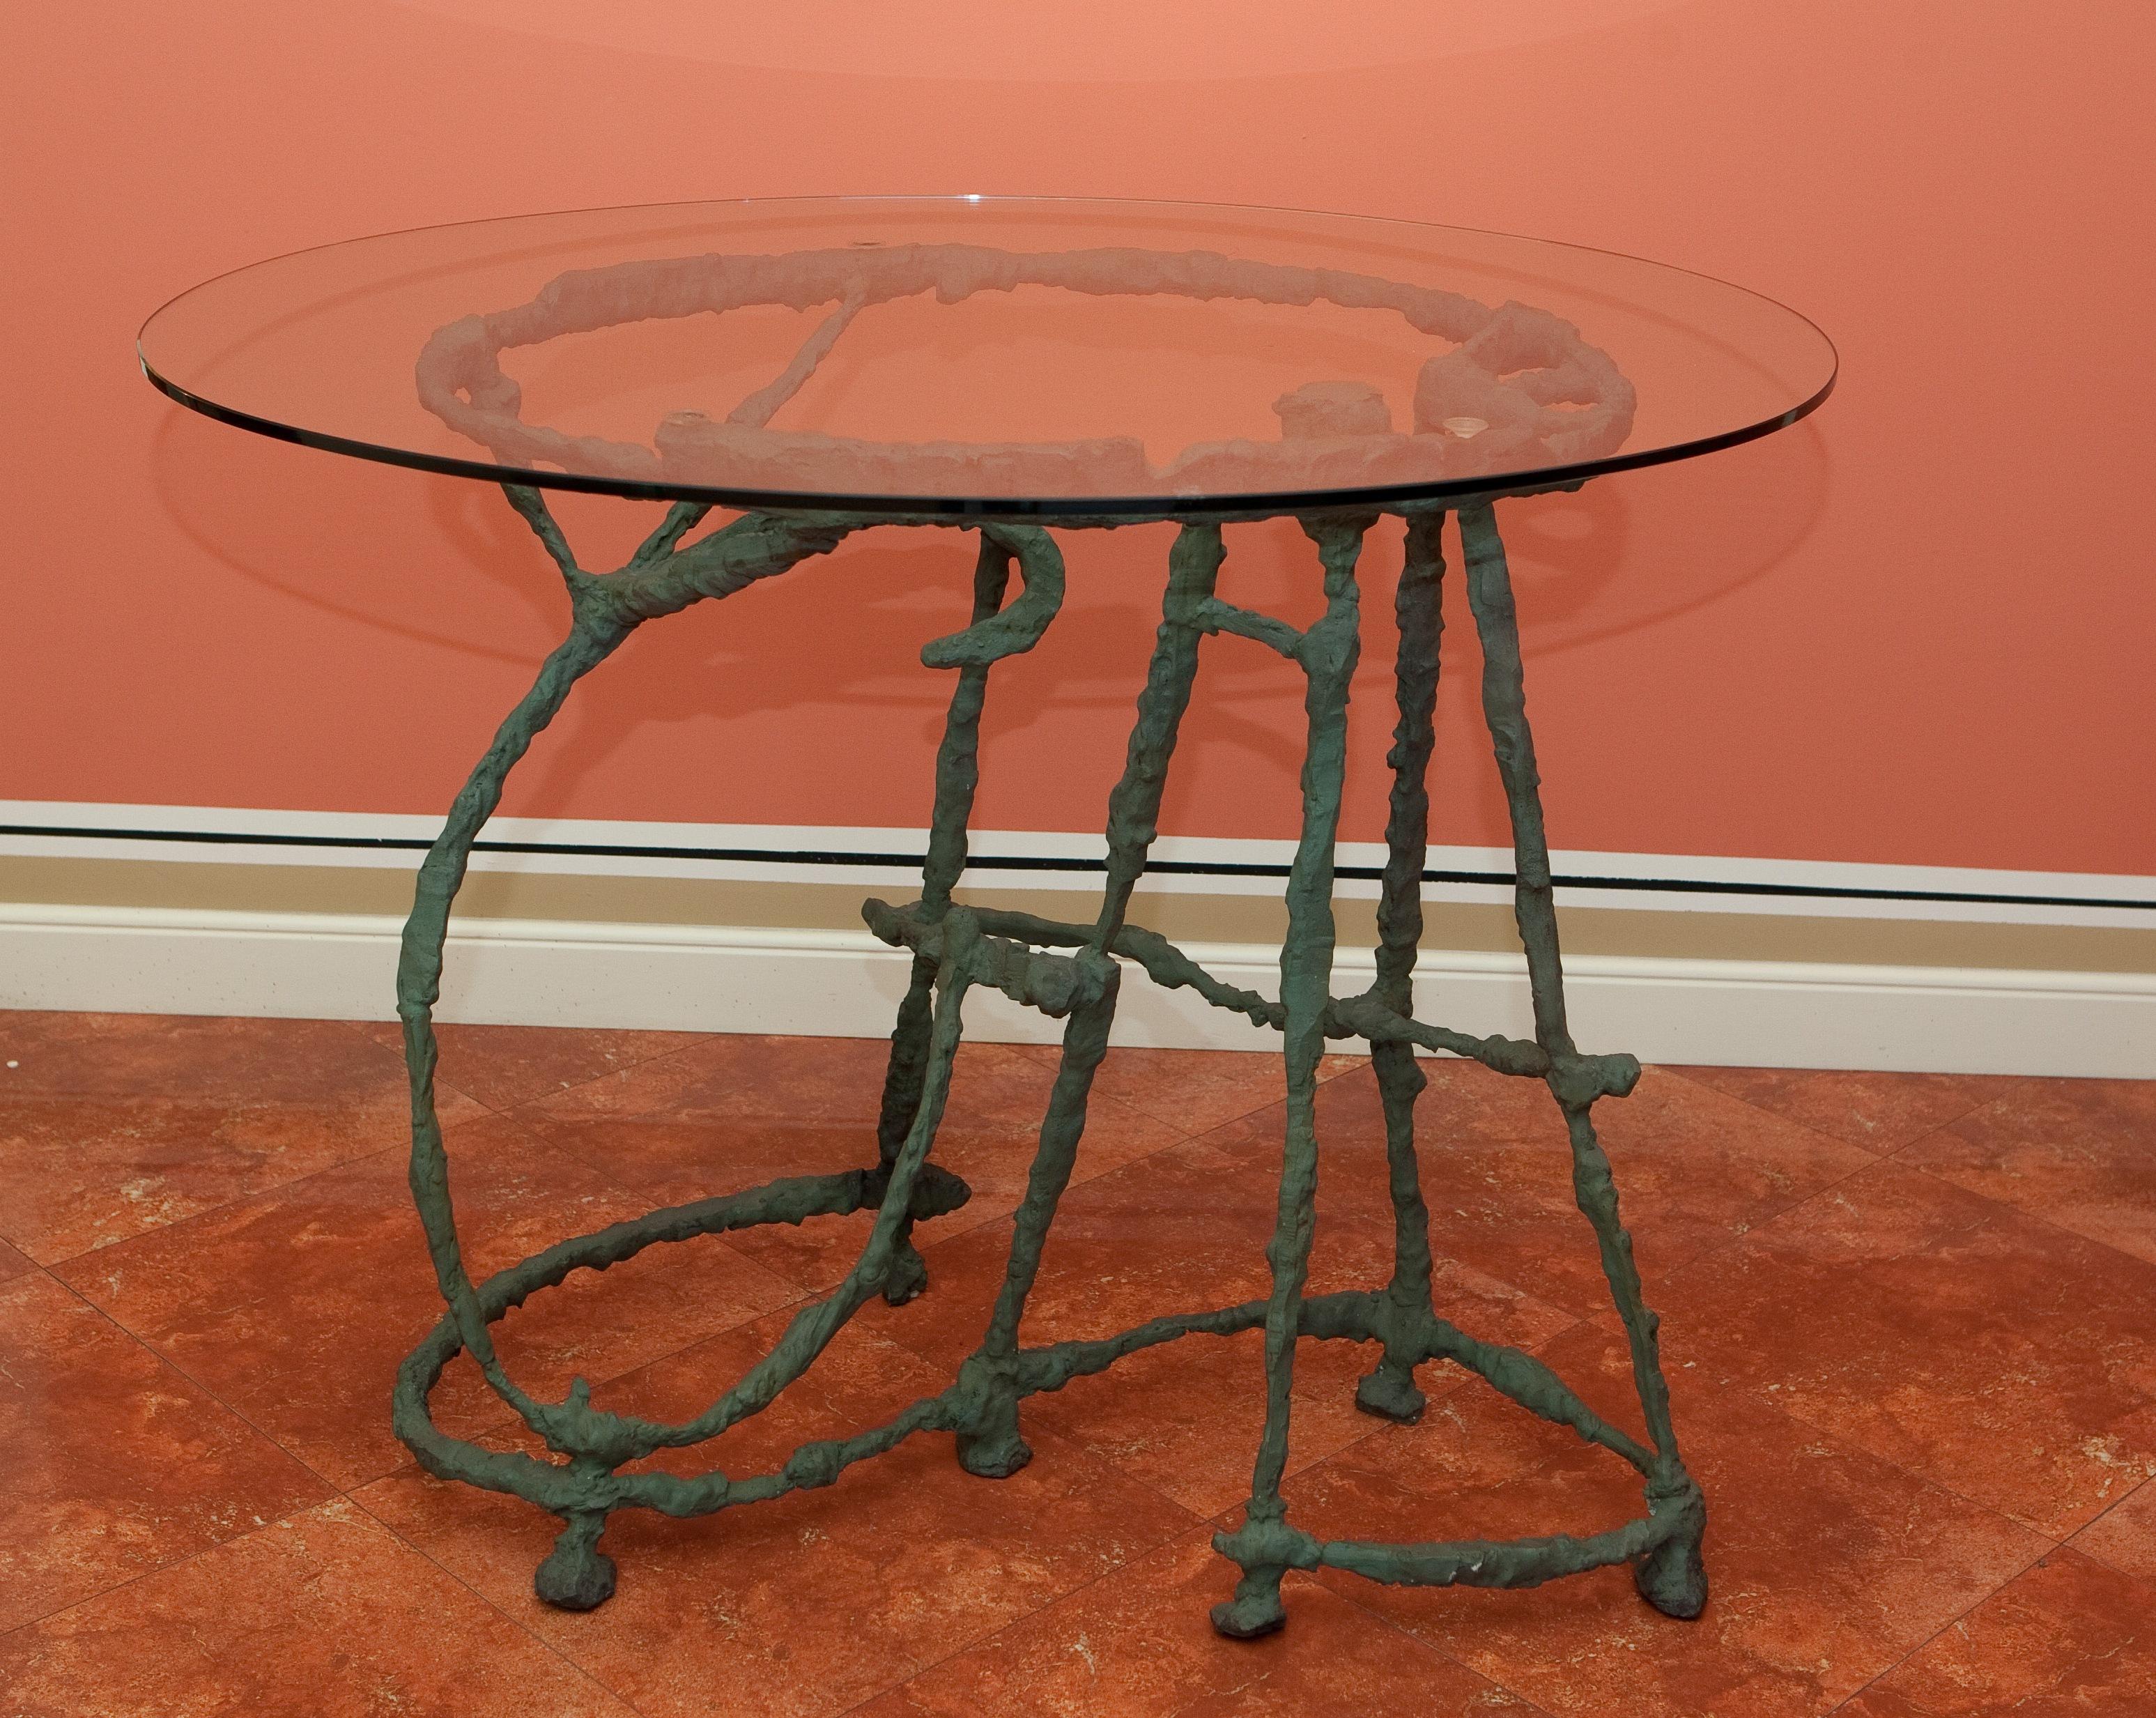 6)Chia – tavolo